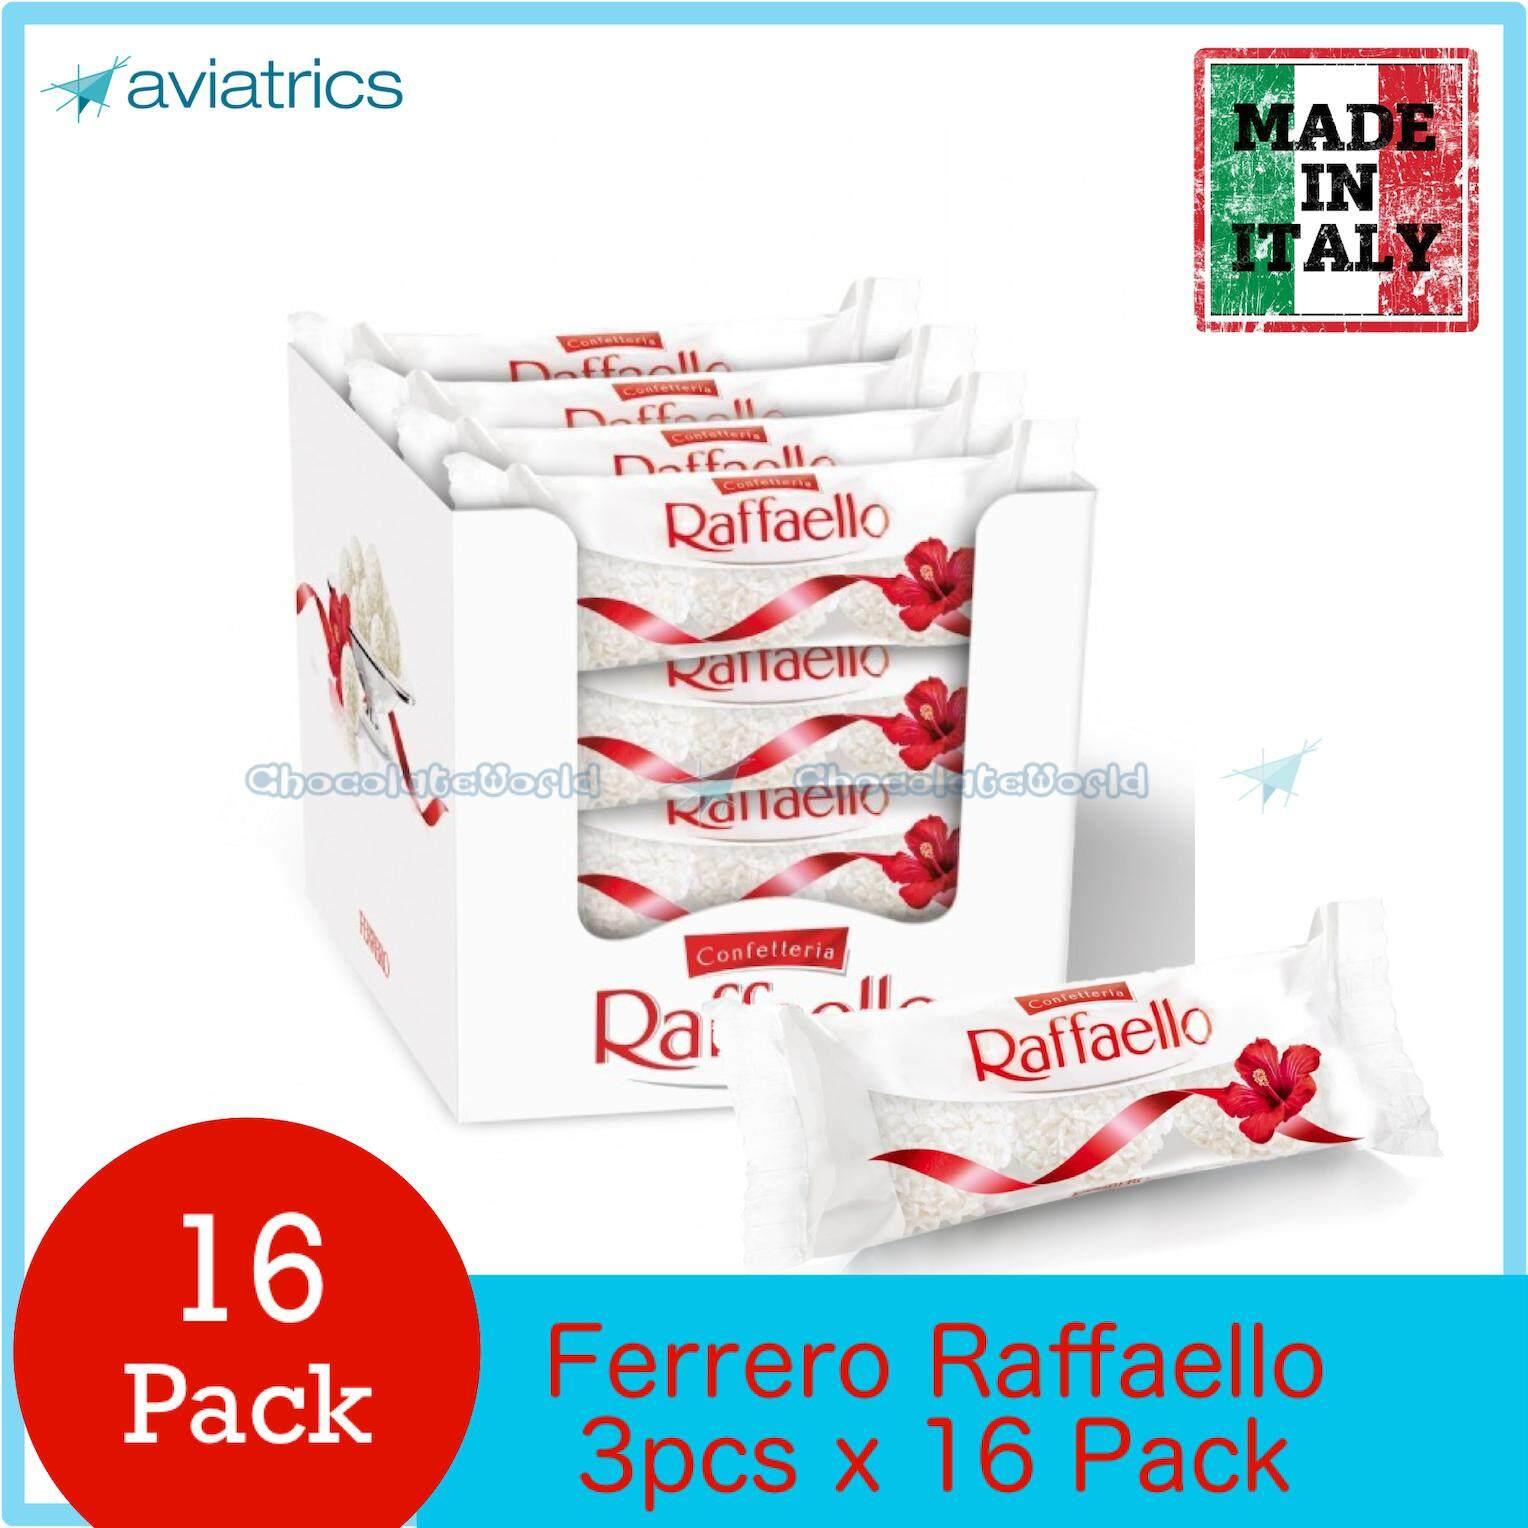 Ferrero Raffaello T3 Gift Pack X 16 (Made in Italy)(Made in Italy)